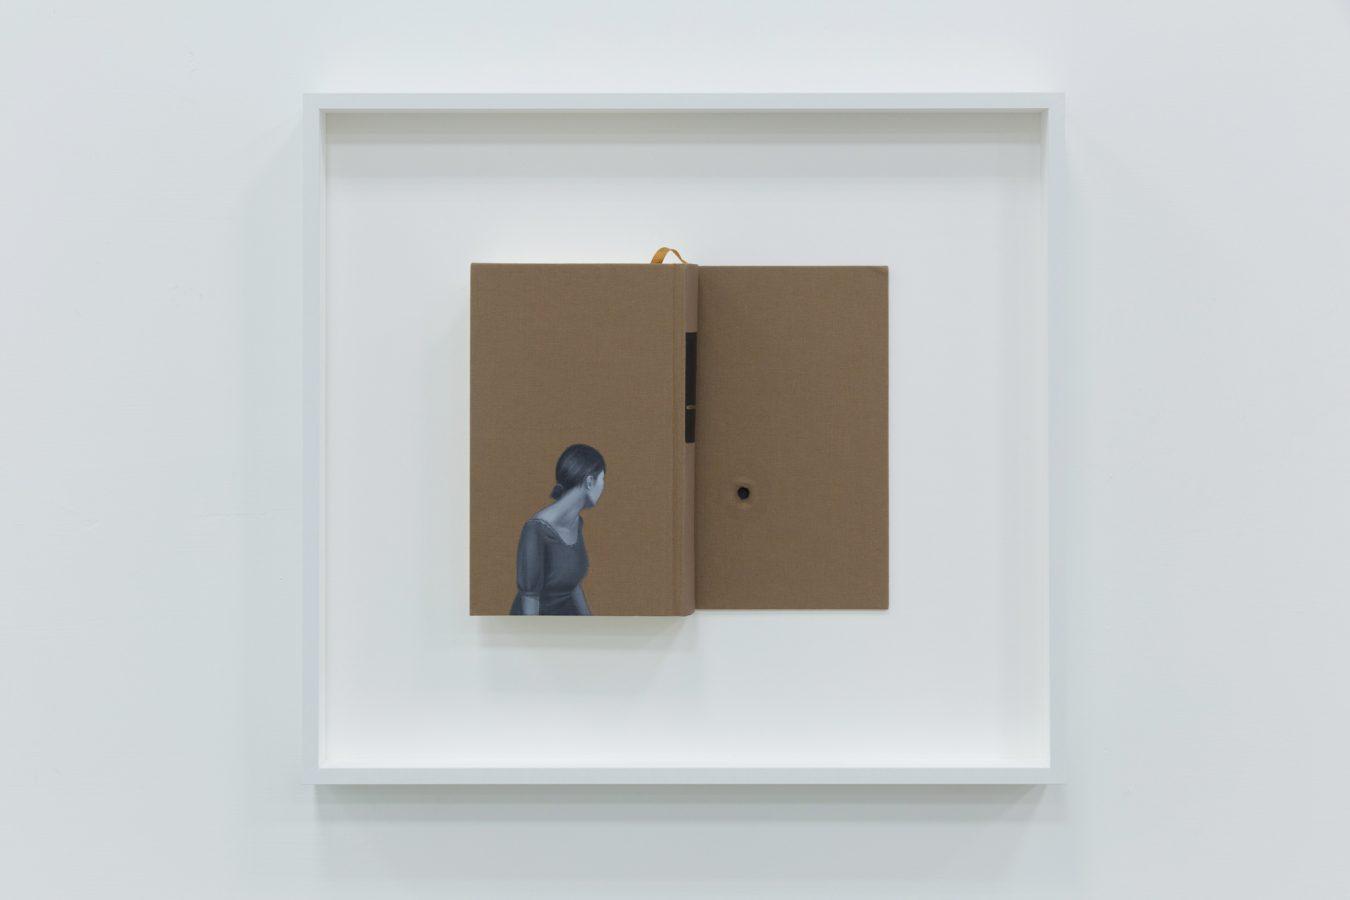 Galeria Pedro Cera – Haiyang Wang, Joyce Ho, Poklong Anading, Mak Ying Tung 2, Filippo Sciascia - We Didn't Mean To Break It (But It's Ok, We Can Fix It)